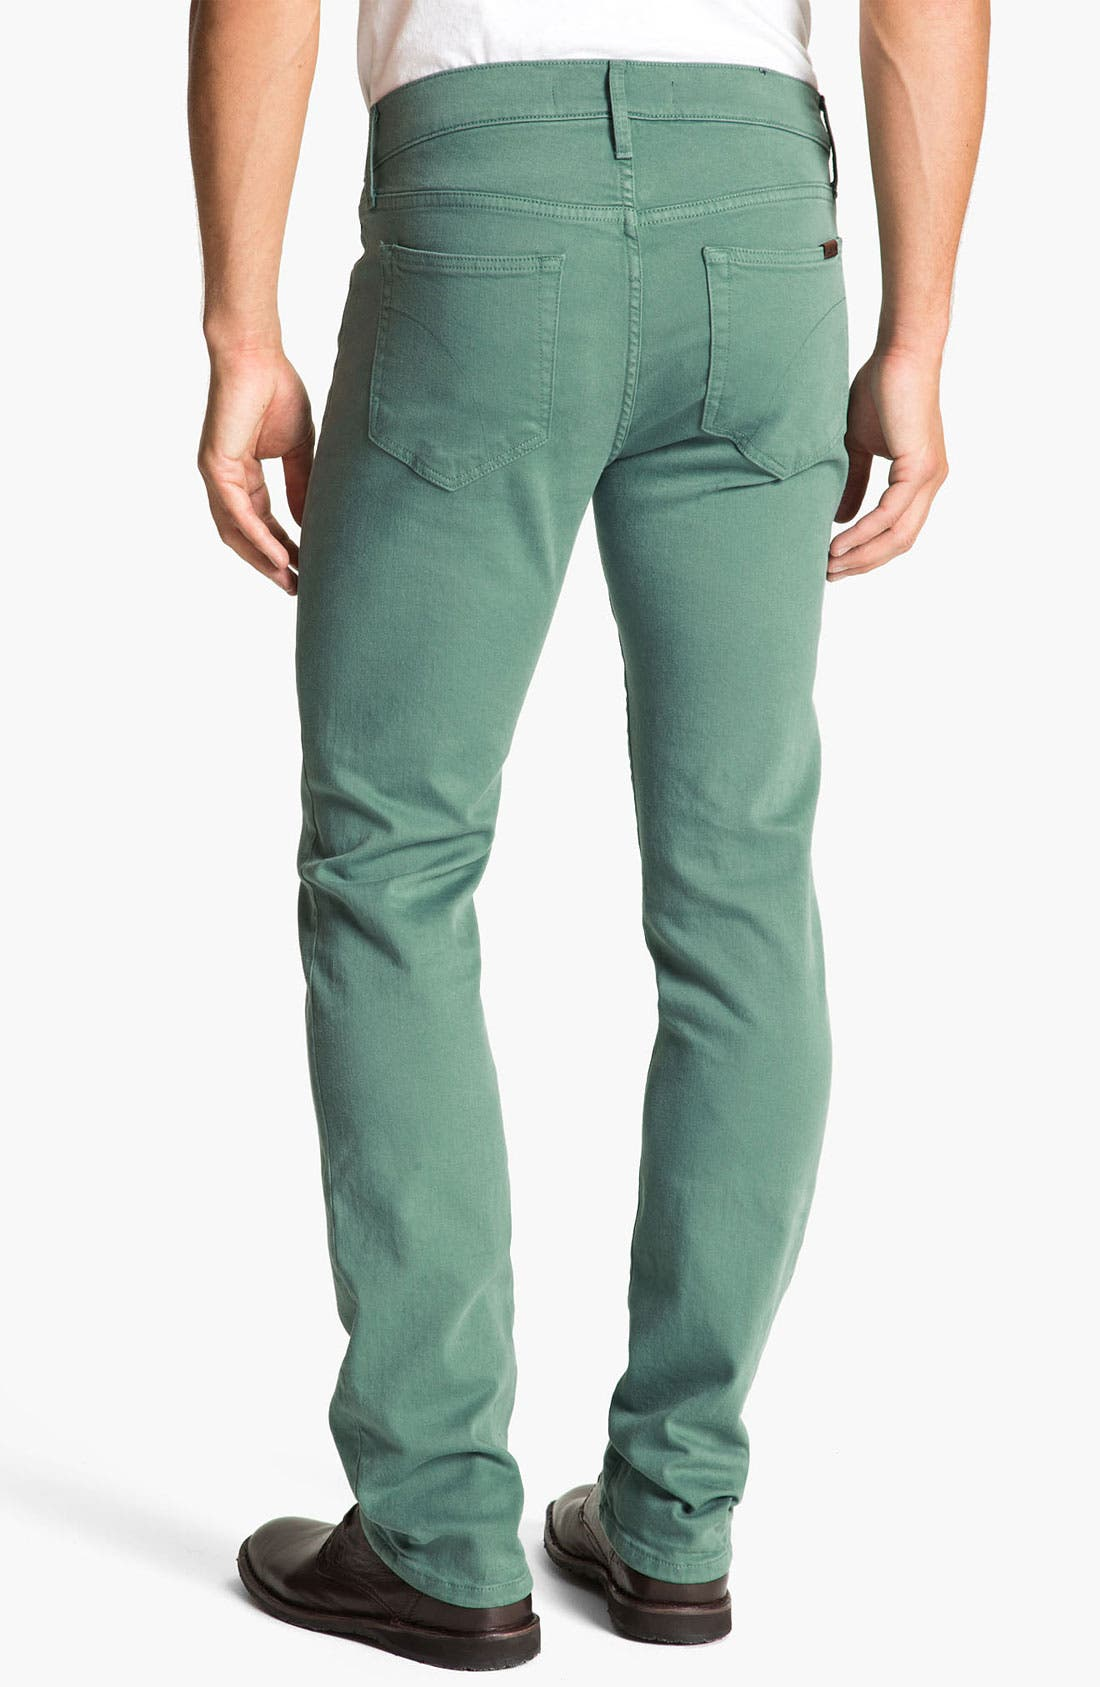 Alternate Image 1 Selected - Joe's 'Brixton' Slim Straight Leg Jeans (Atlantic)